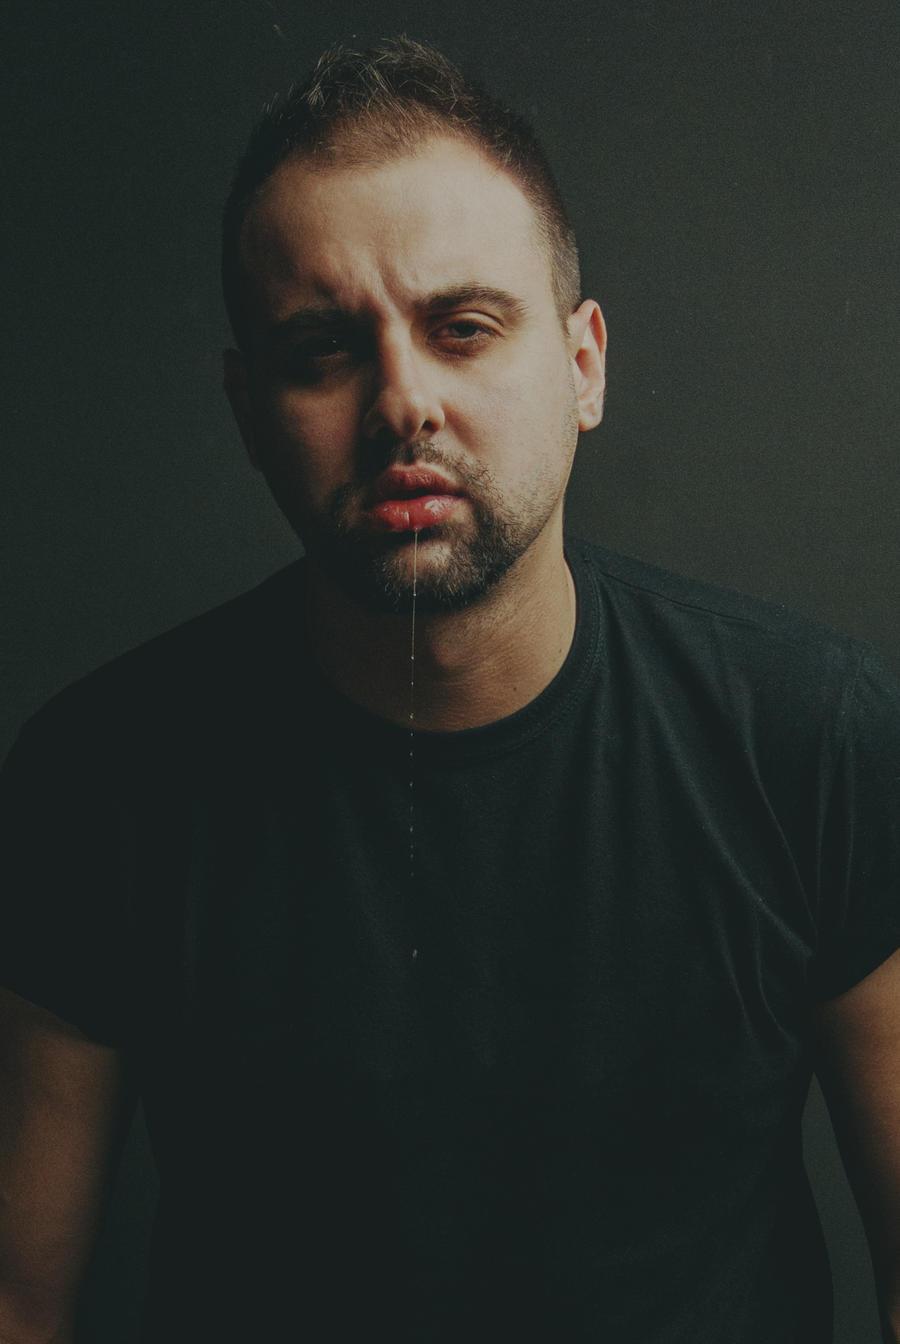 NickSachos's Profile Picture